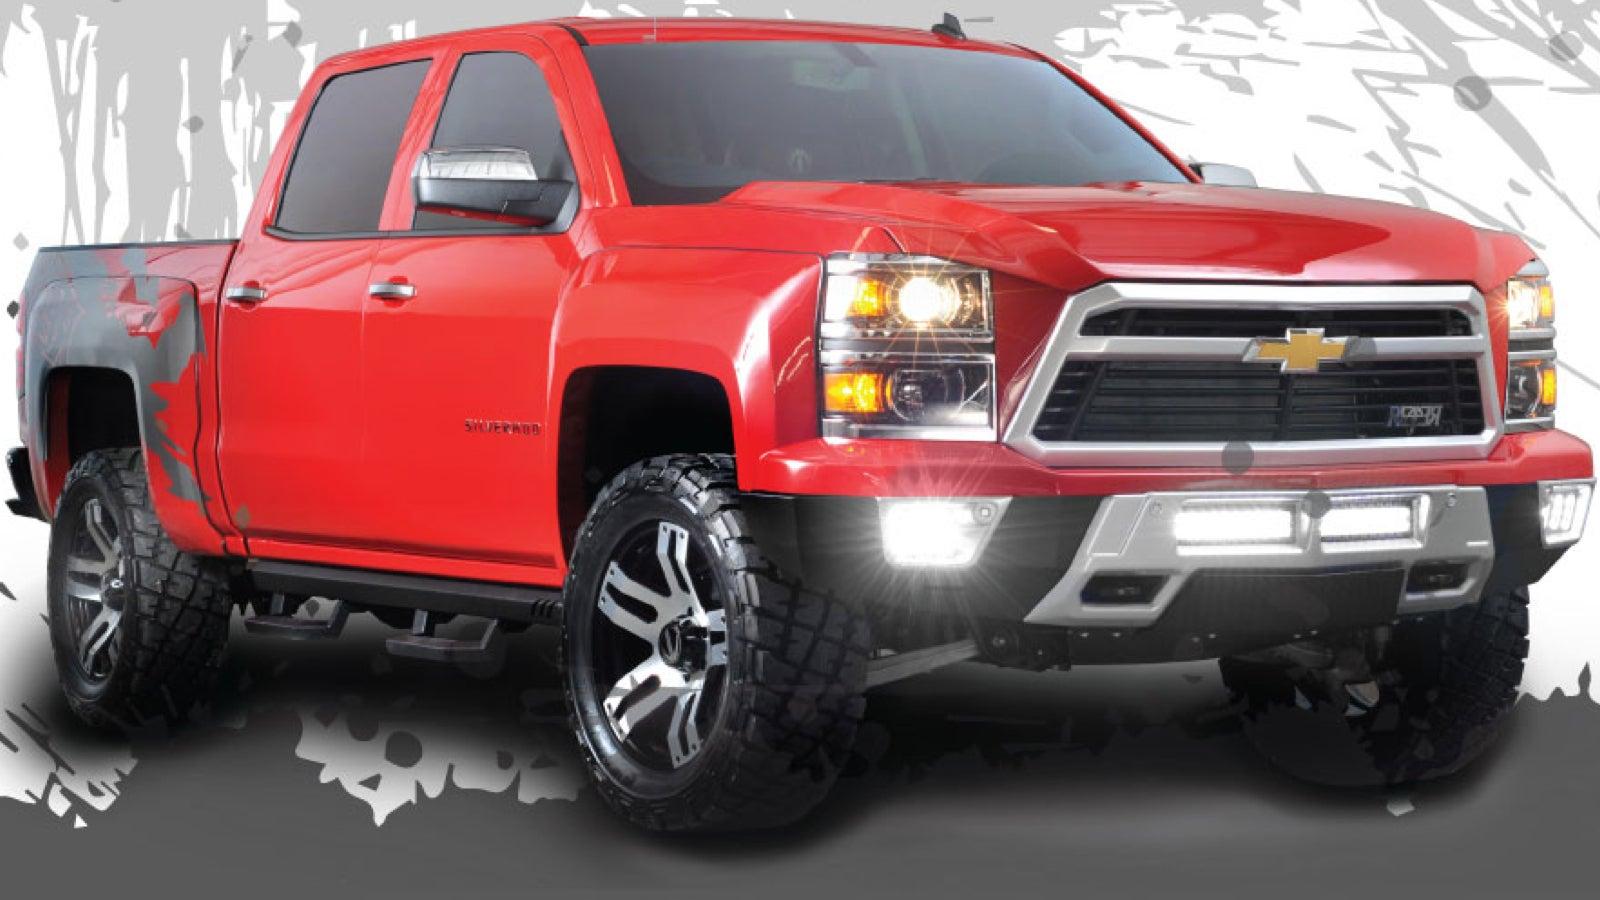 Is The Chevrolet Reaper A Real Raptor Killer Or Dealership Side Show?